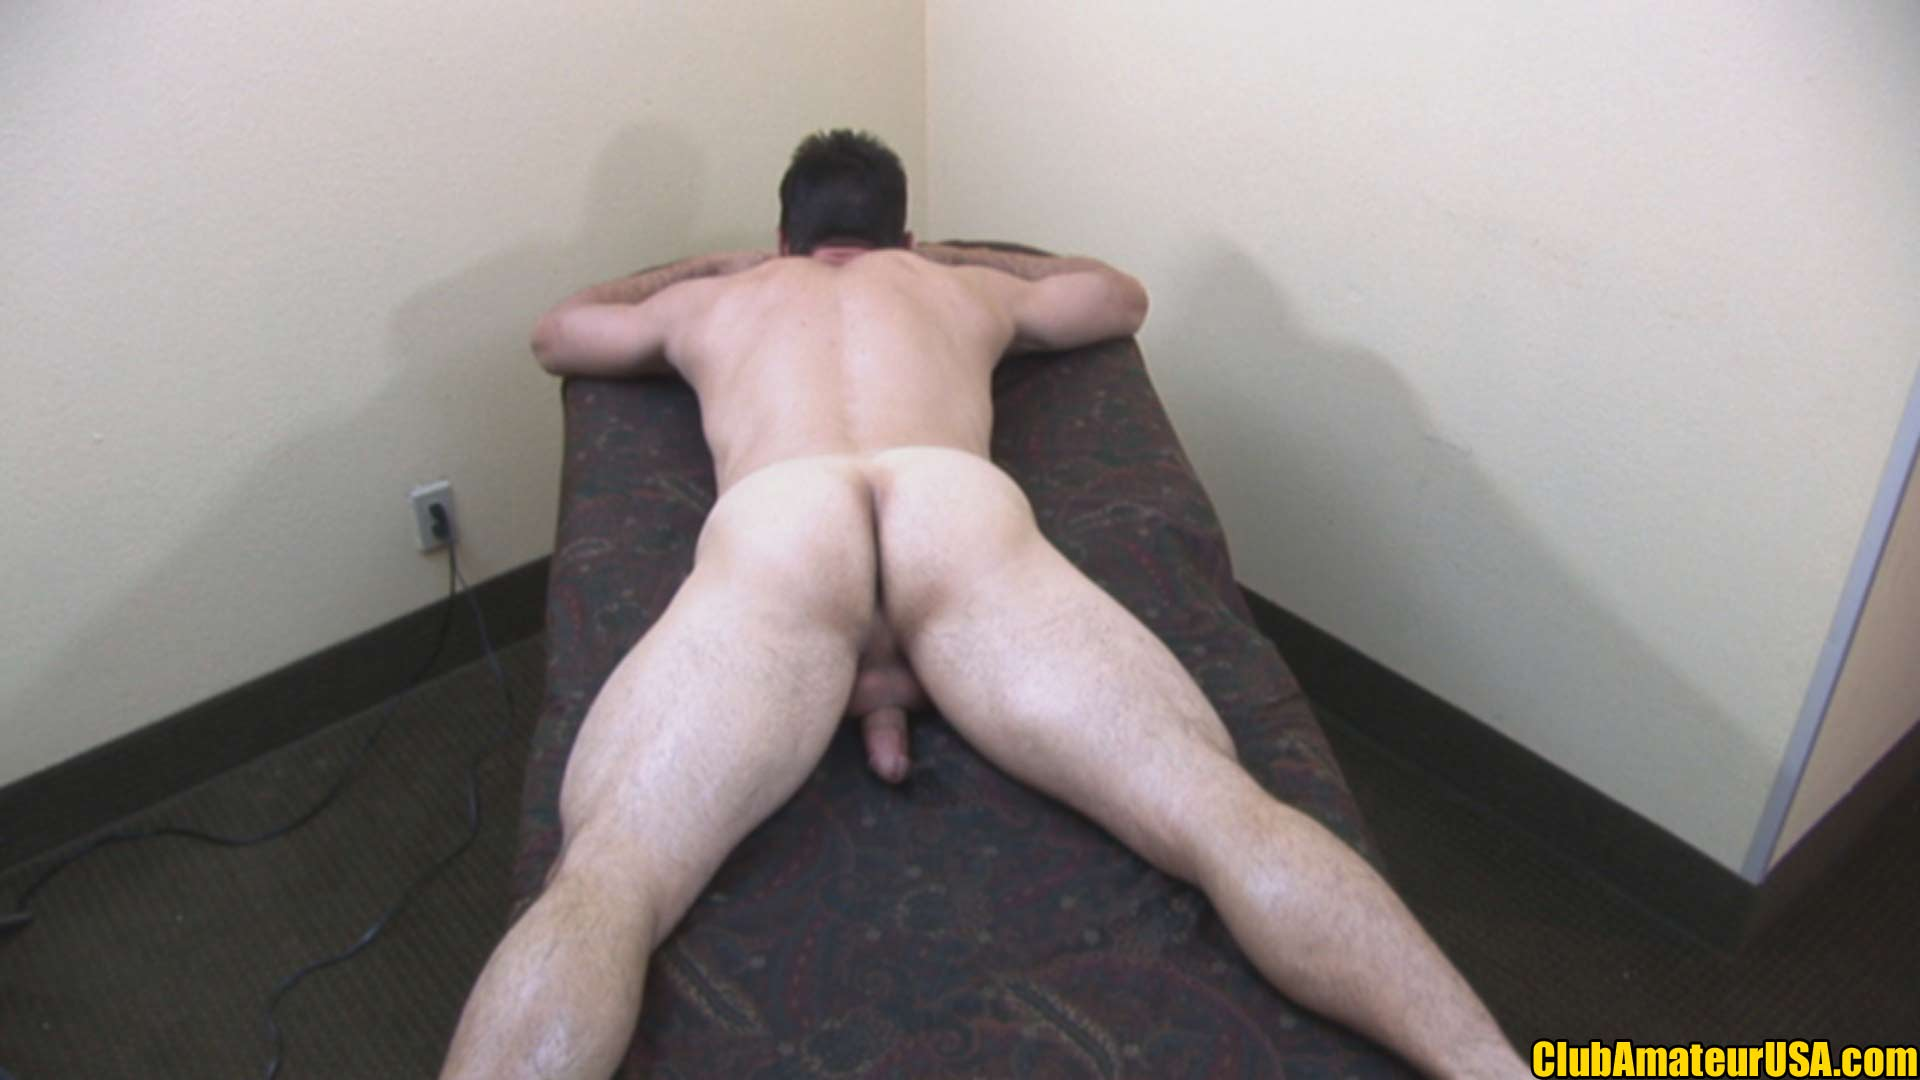 Hentai sex slave shows